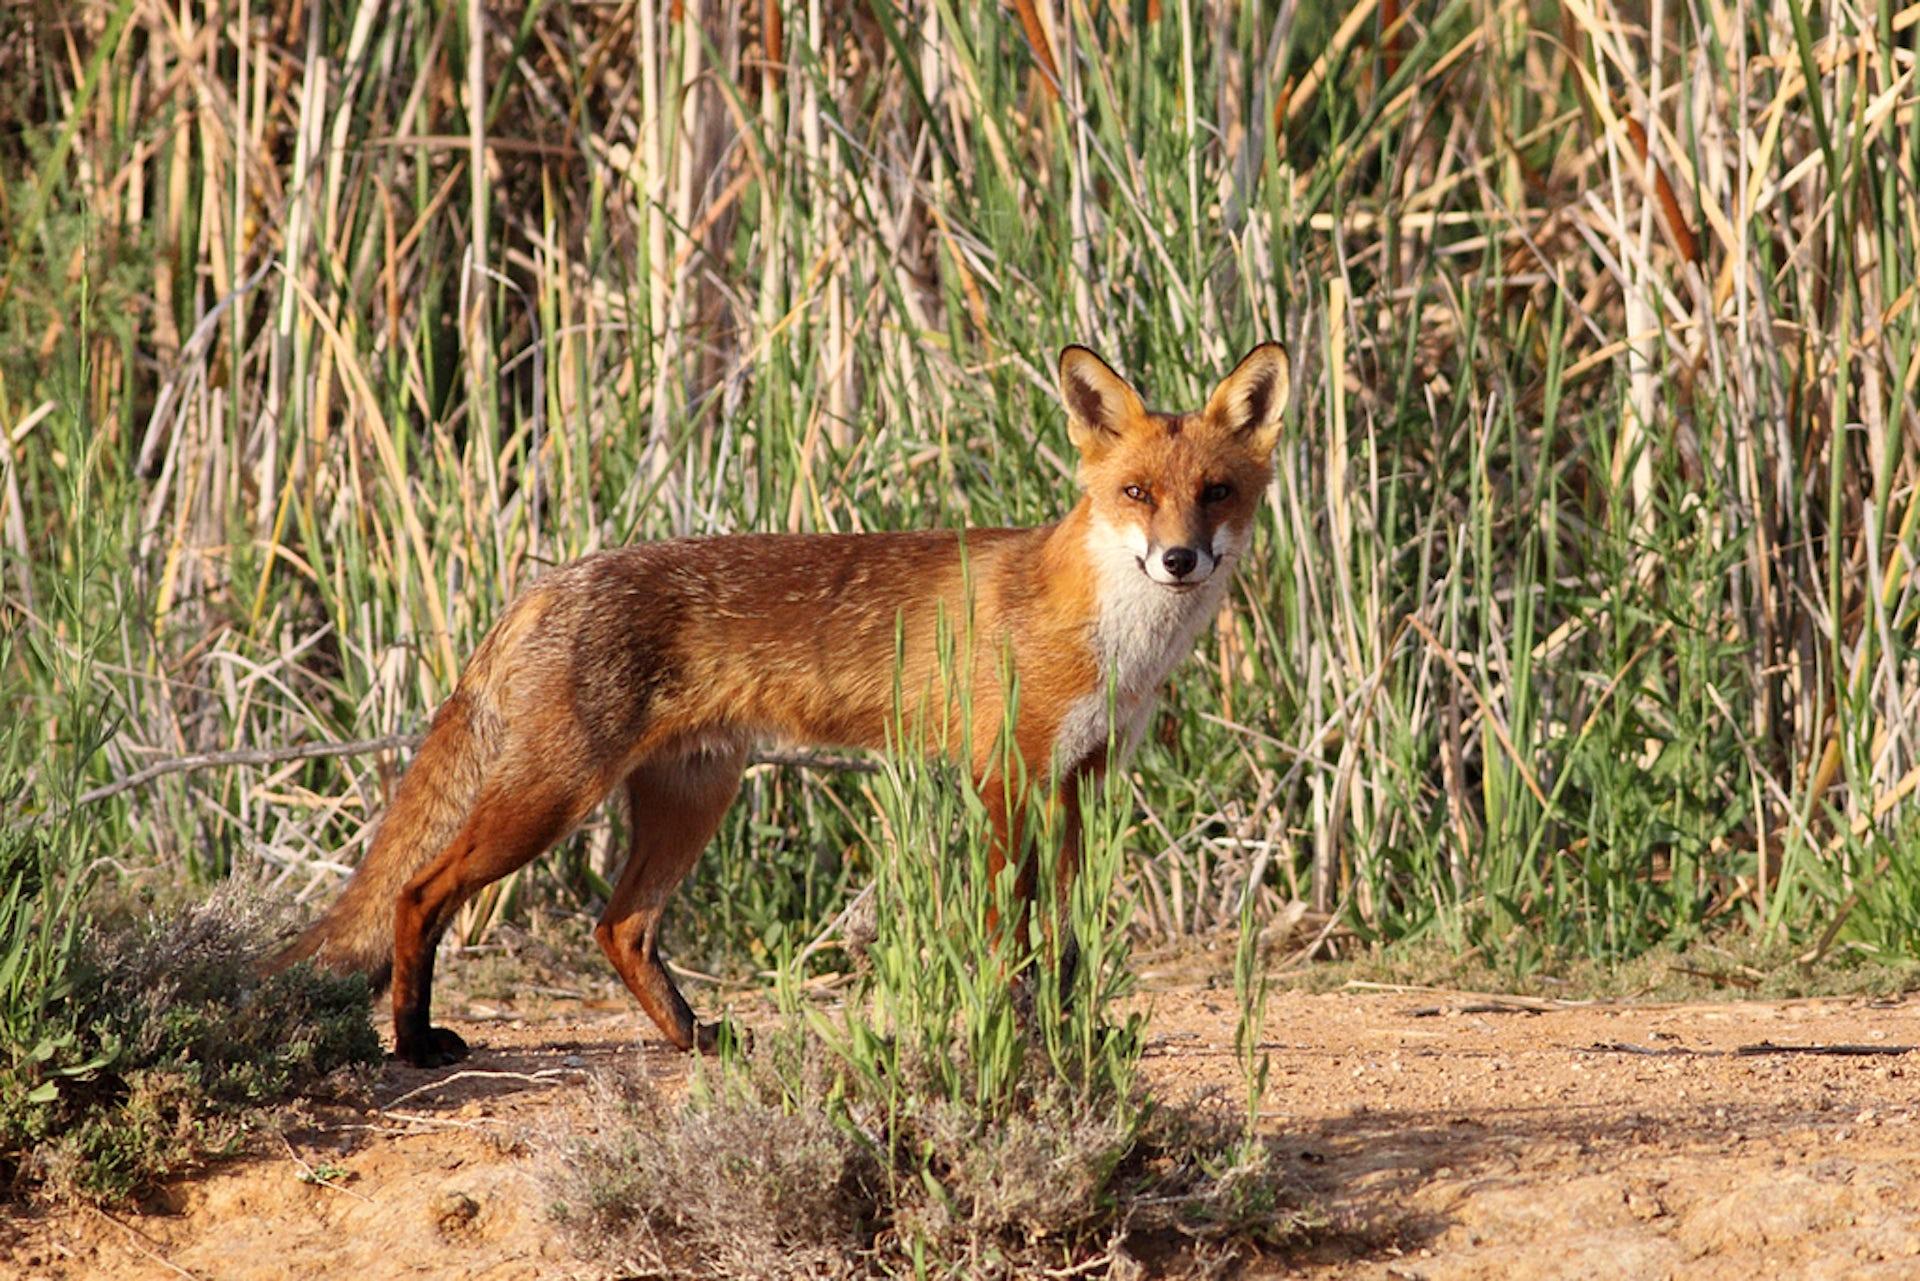 Red fox, Australian invasive species